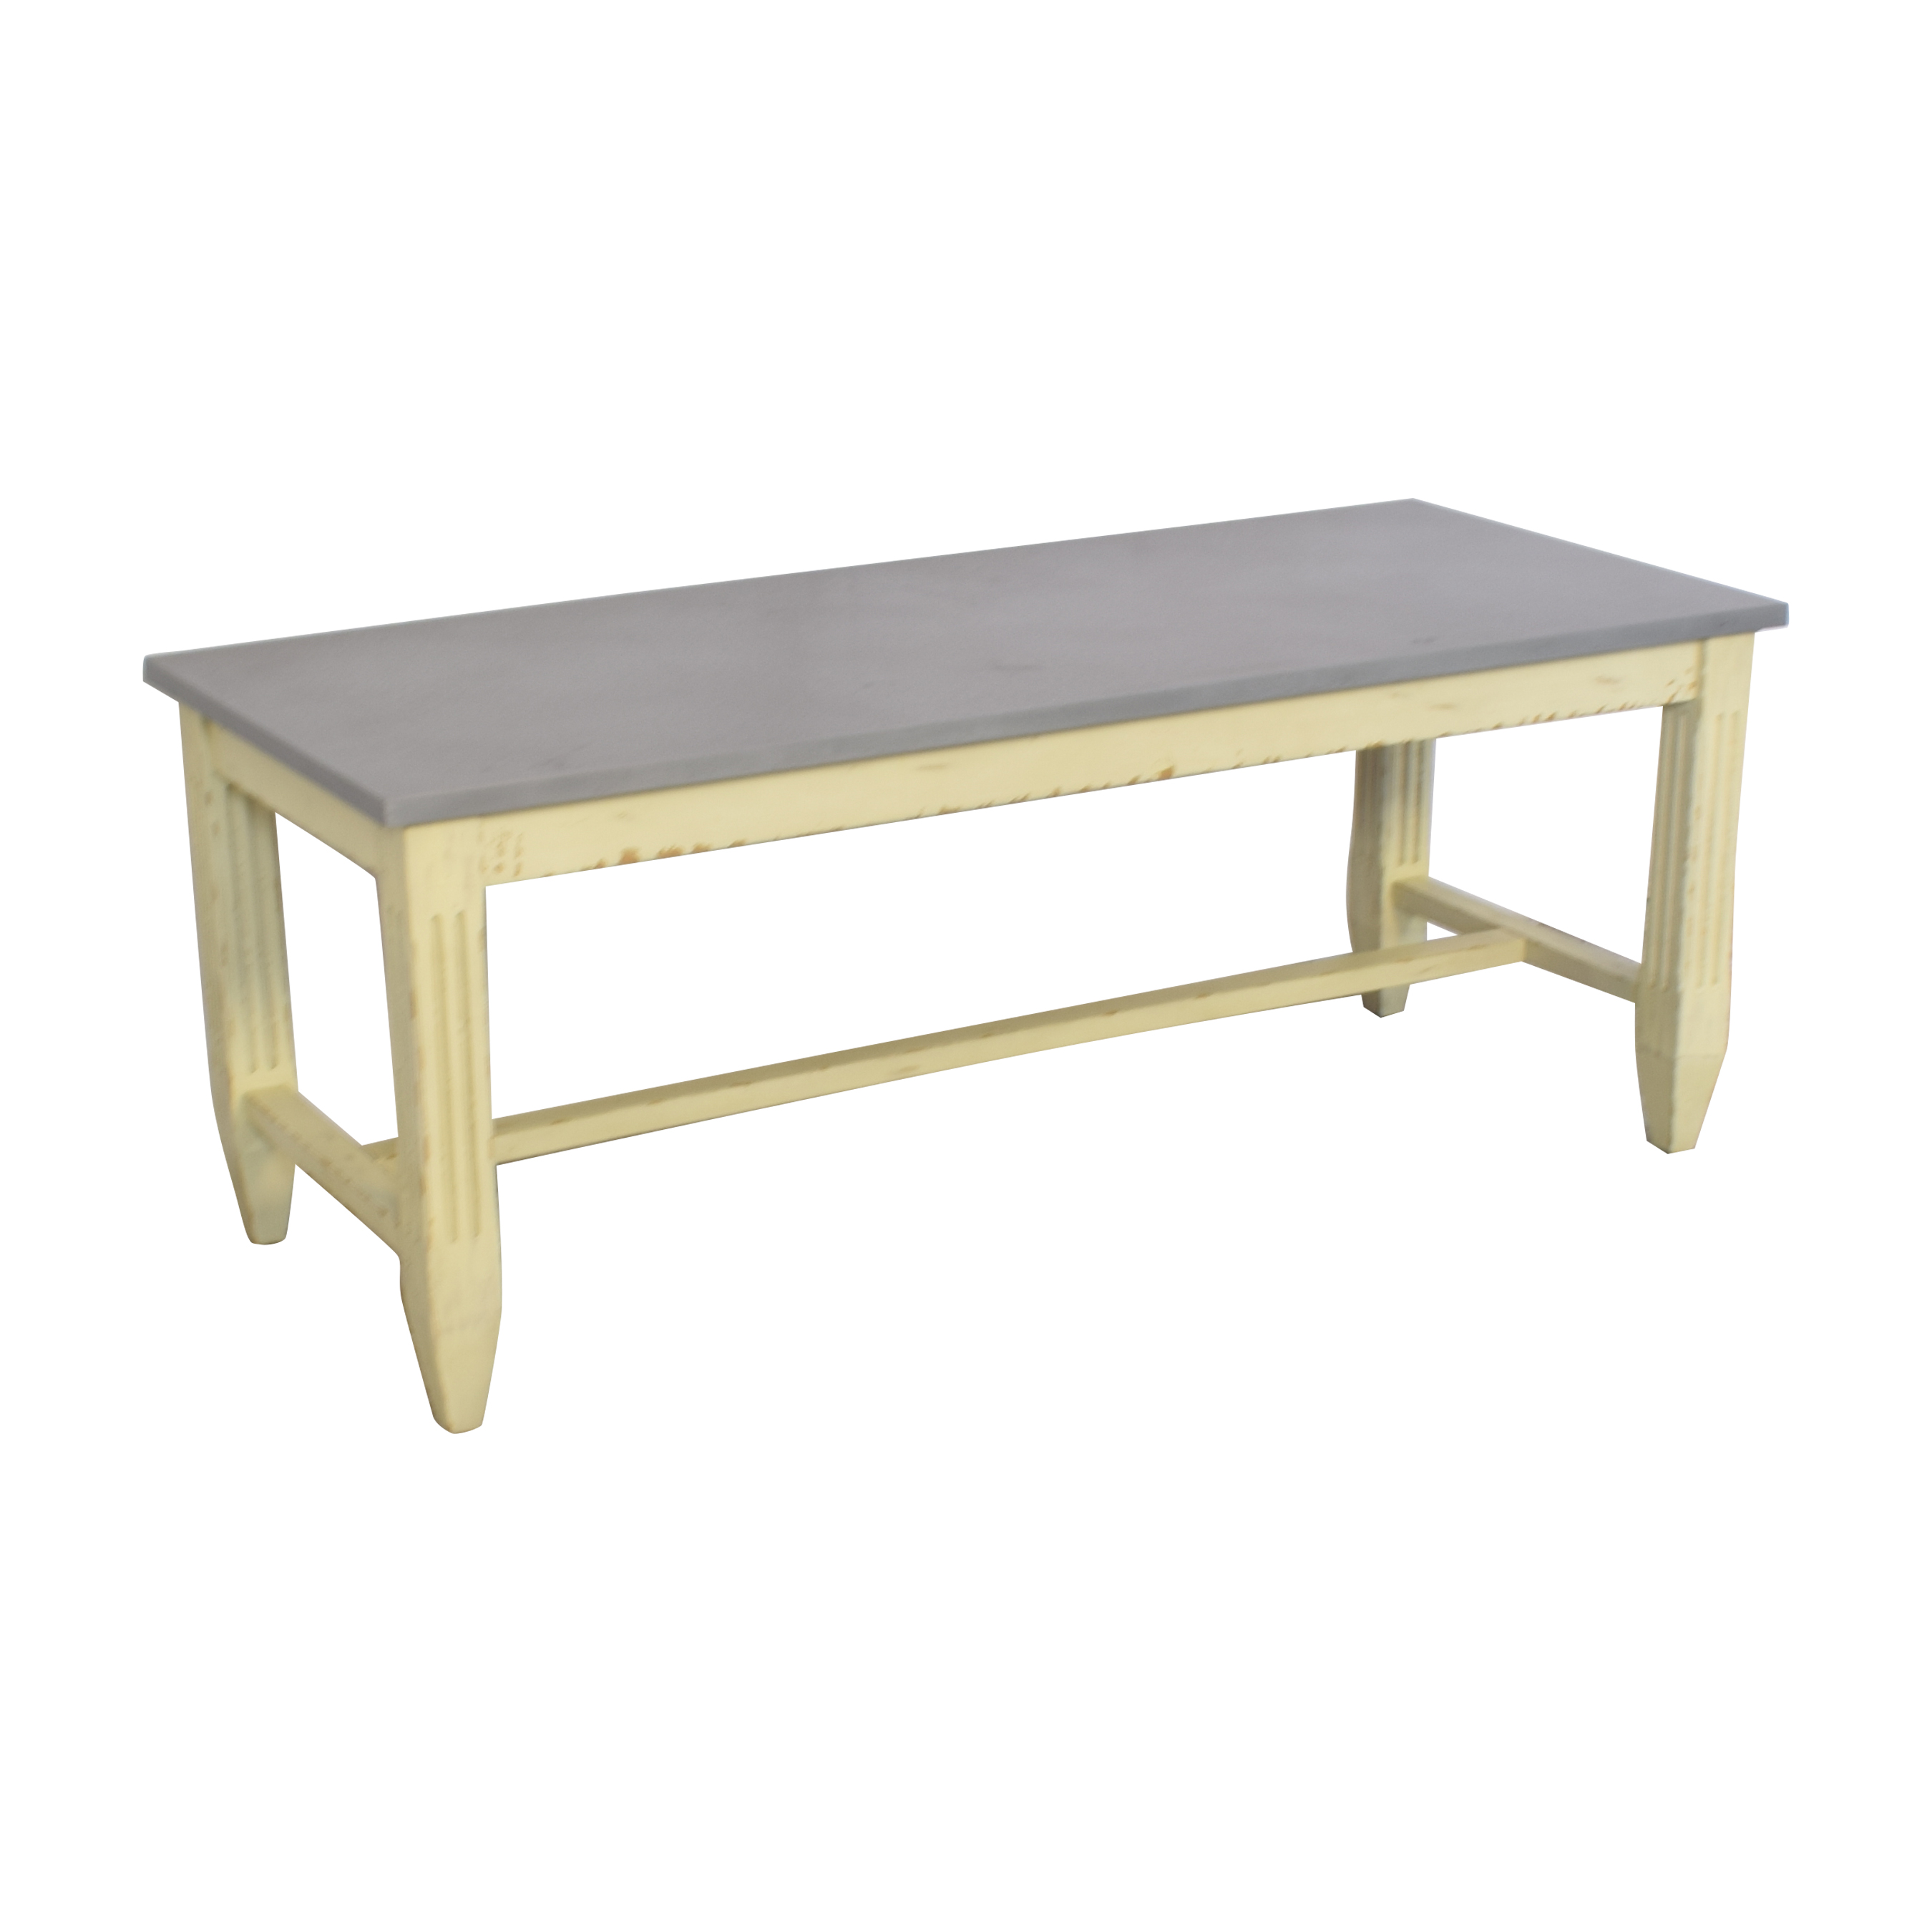 85 Off Ballard Designs Messina Dining Table Tables